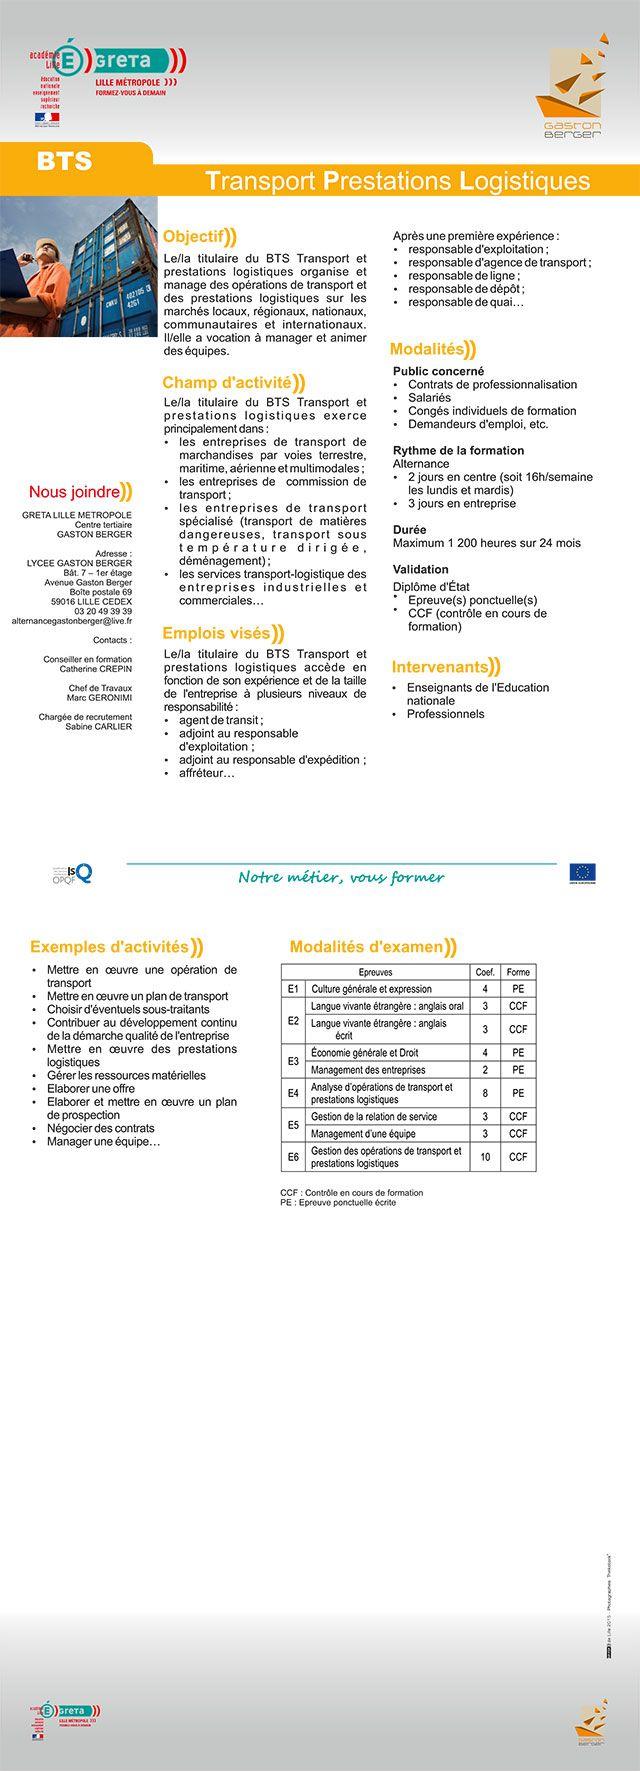 Formation Bts Transport Prestations Logistiques Technicien